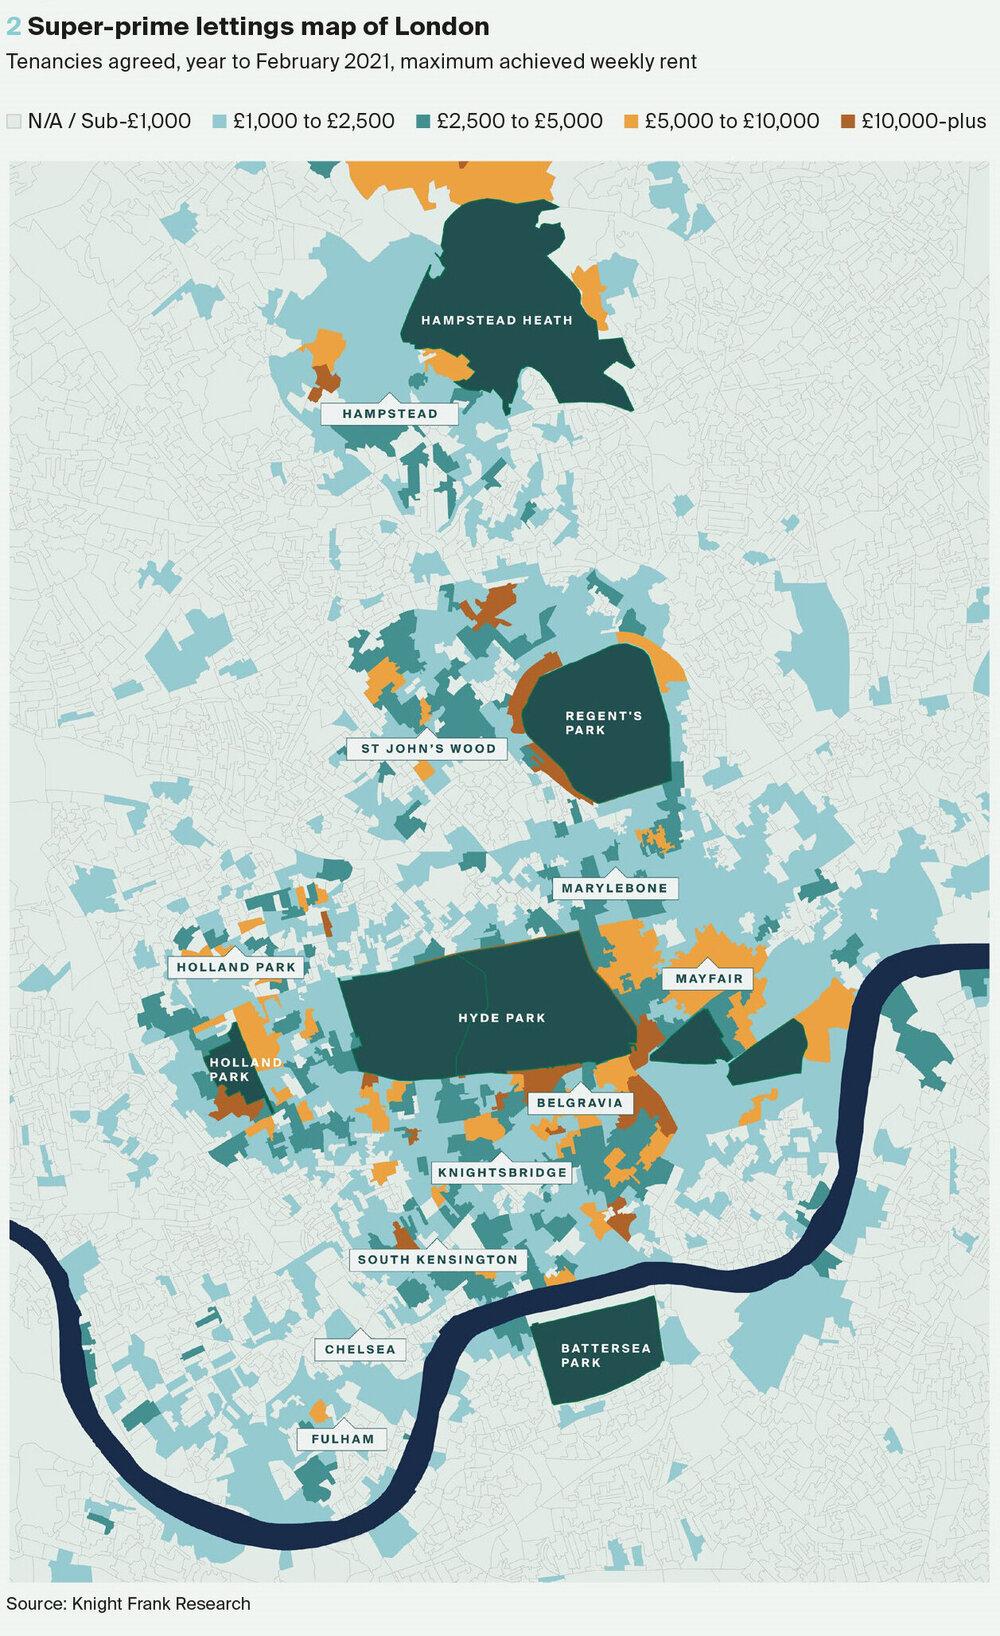 Super-prime-lettings-map-of-London.jpg